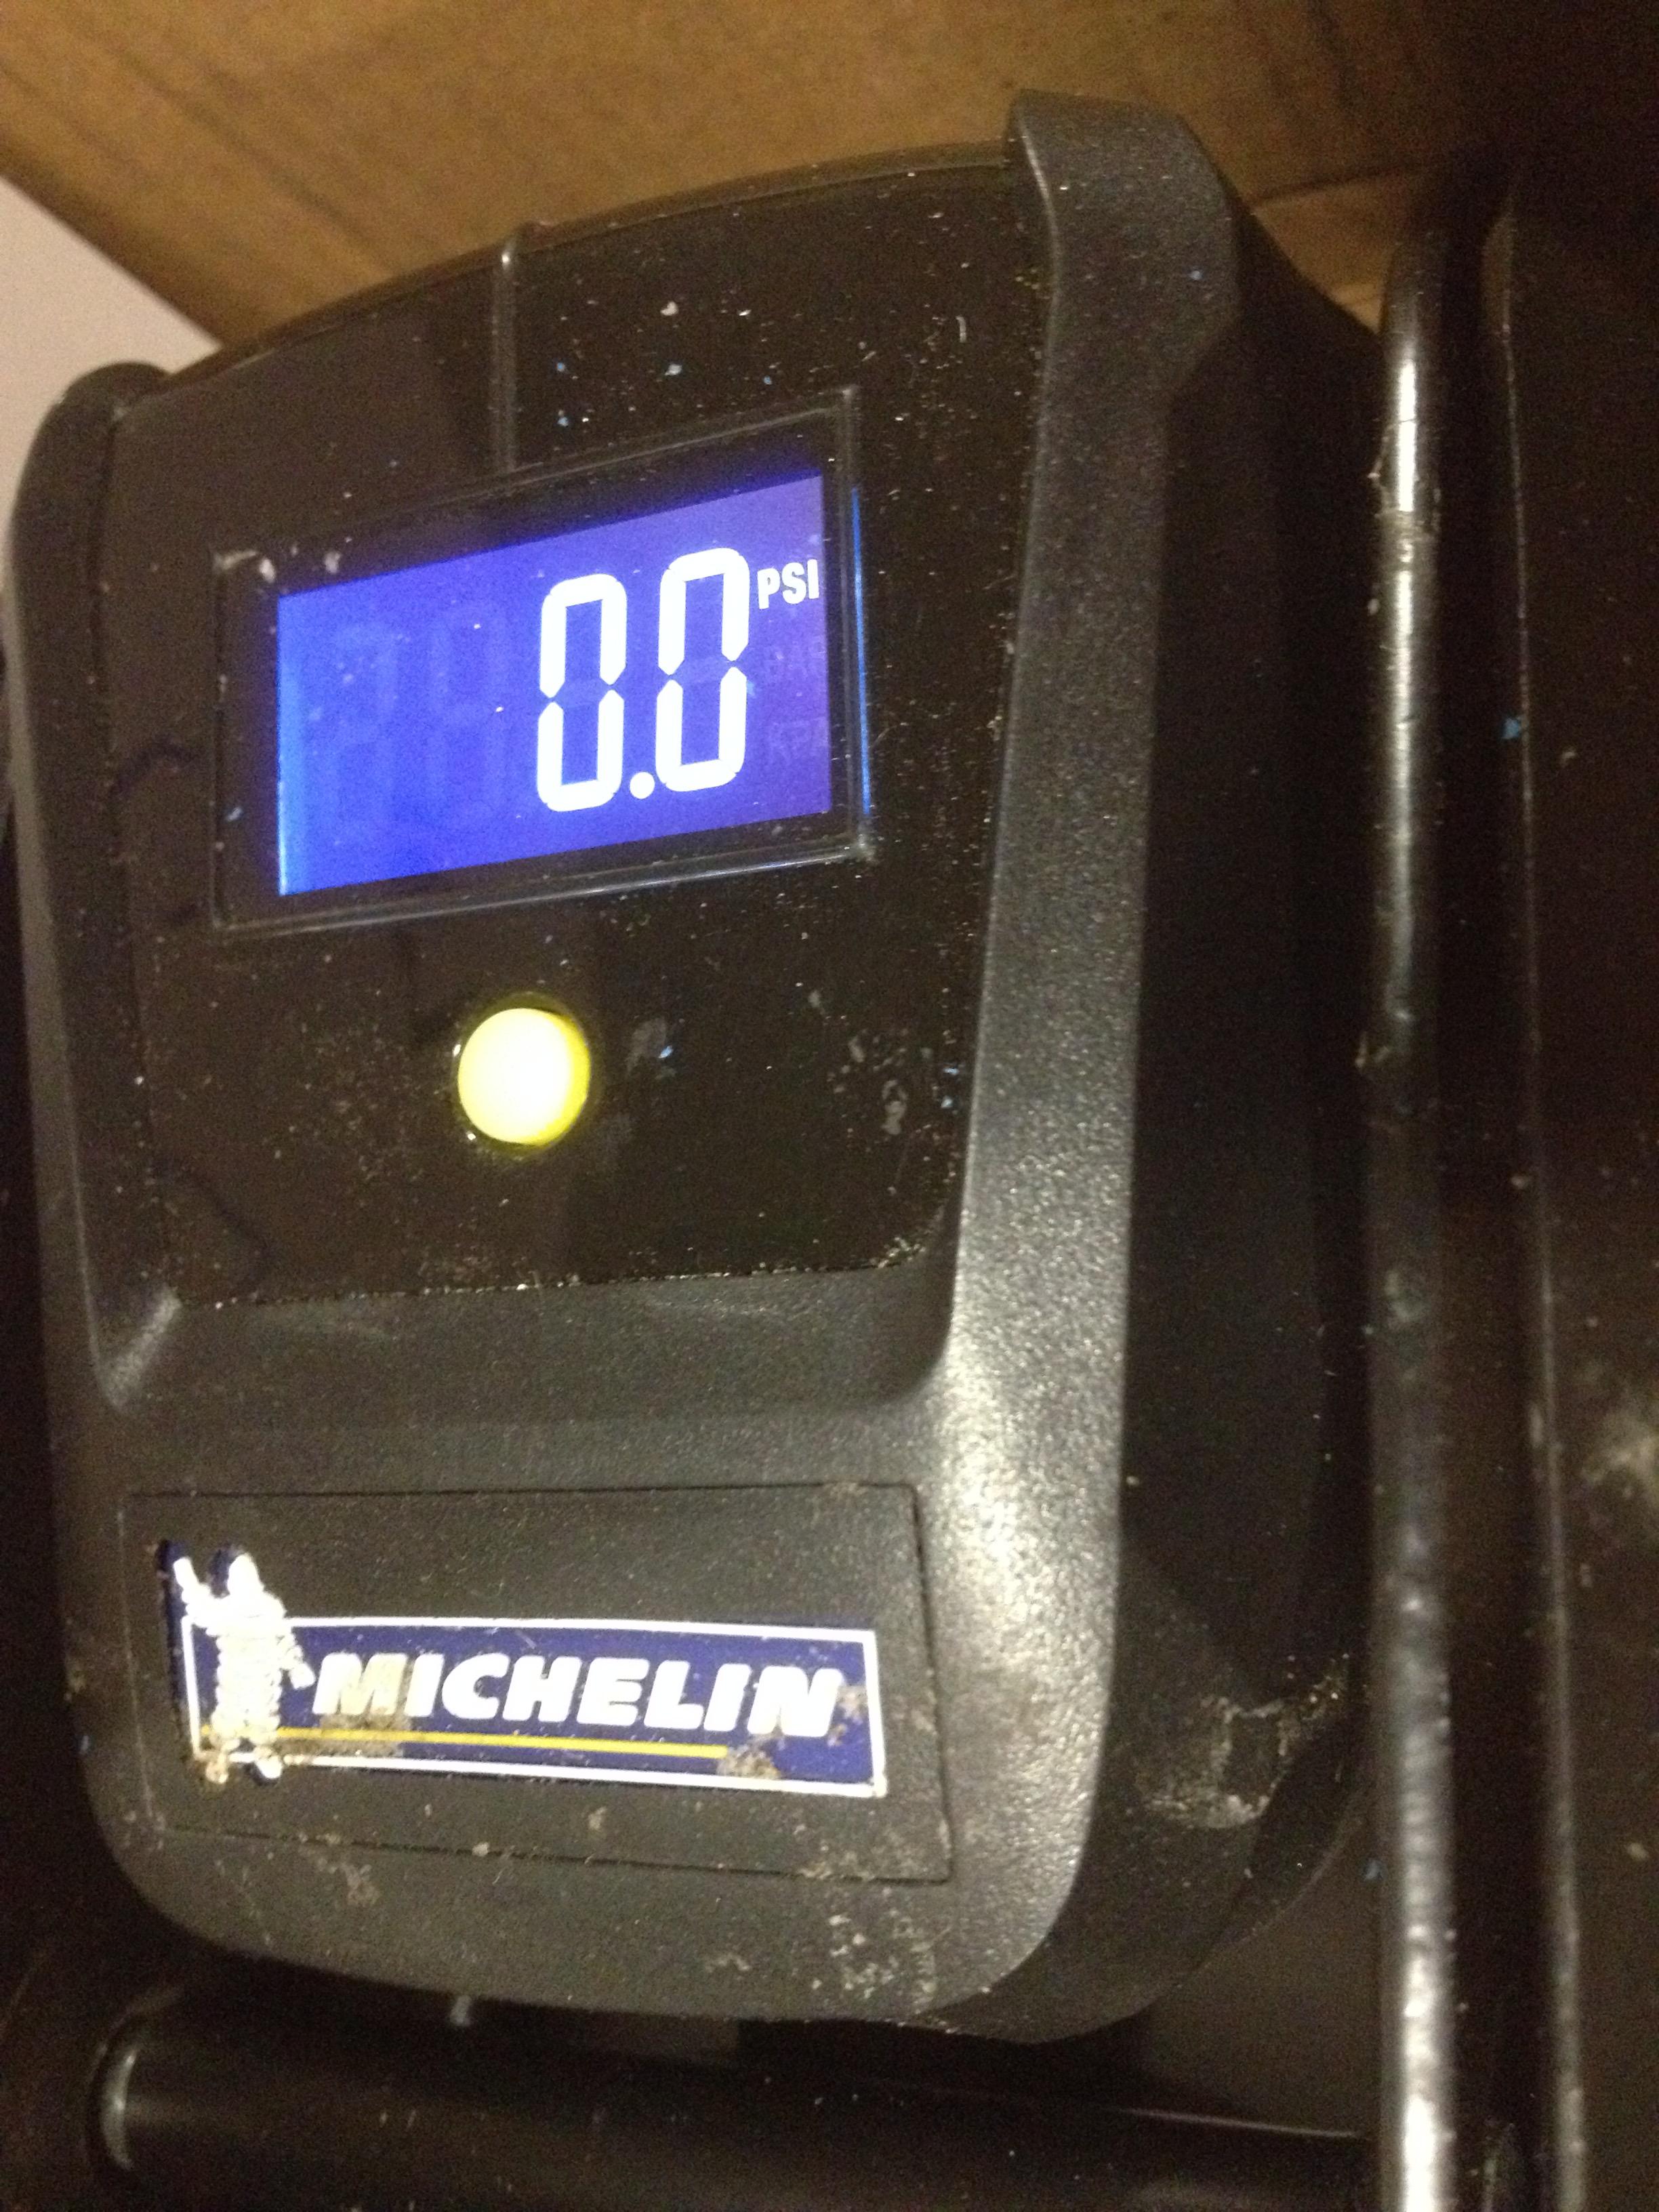 1 x Michelin Digital Foot Pump with ICD digital display 12208